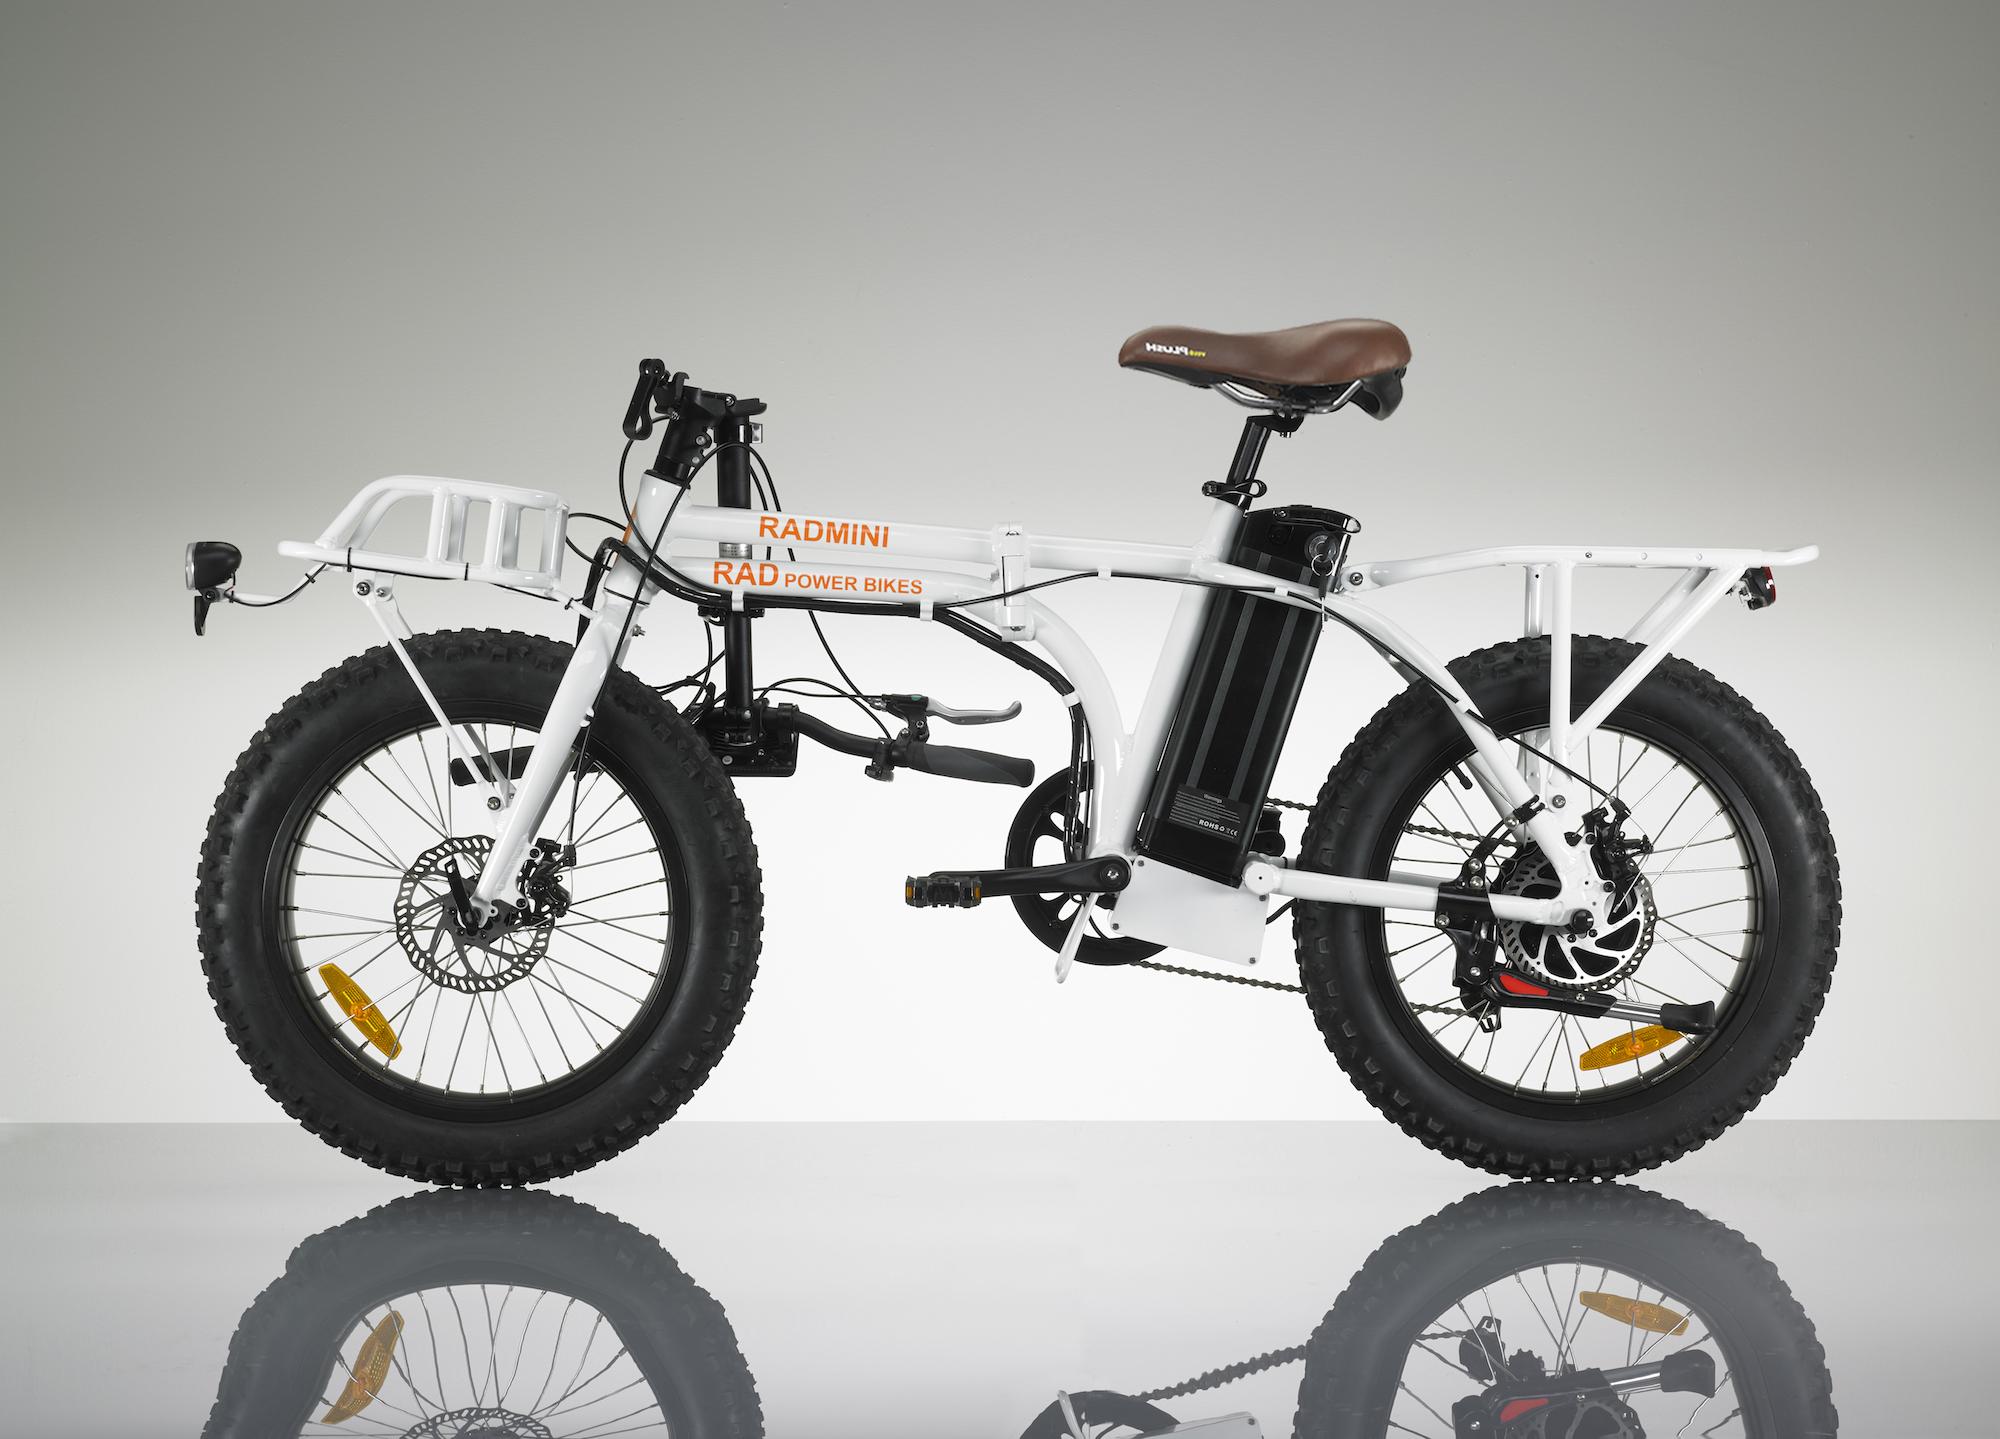 radmini electric bike the coolector. Black Bedroom Furniture Sets. Home Design Ideas